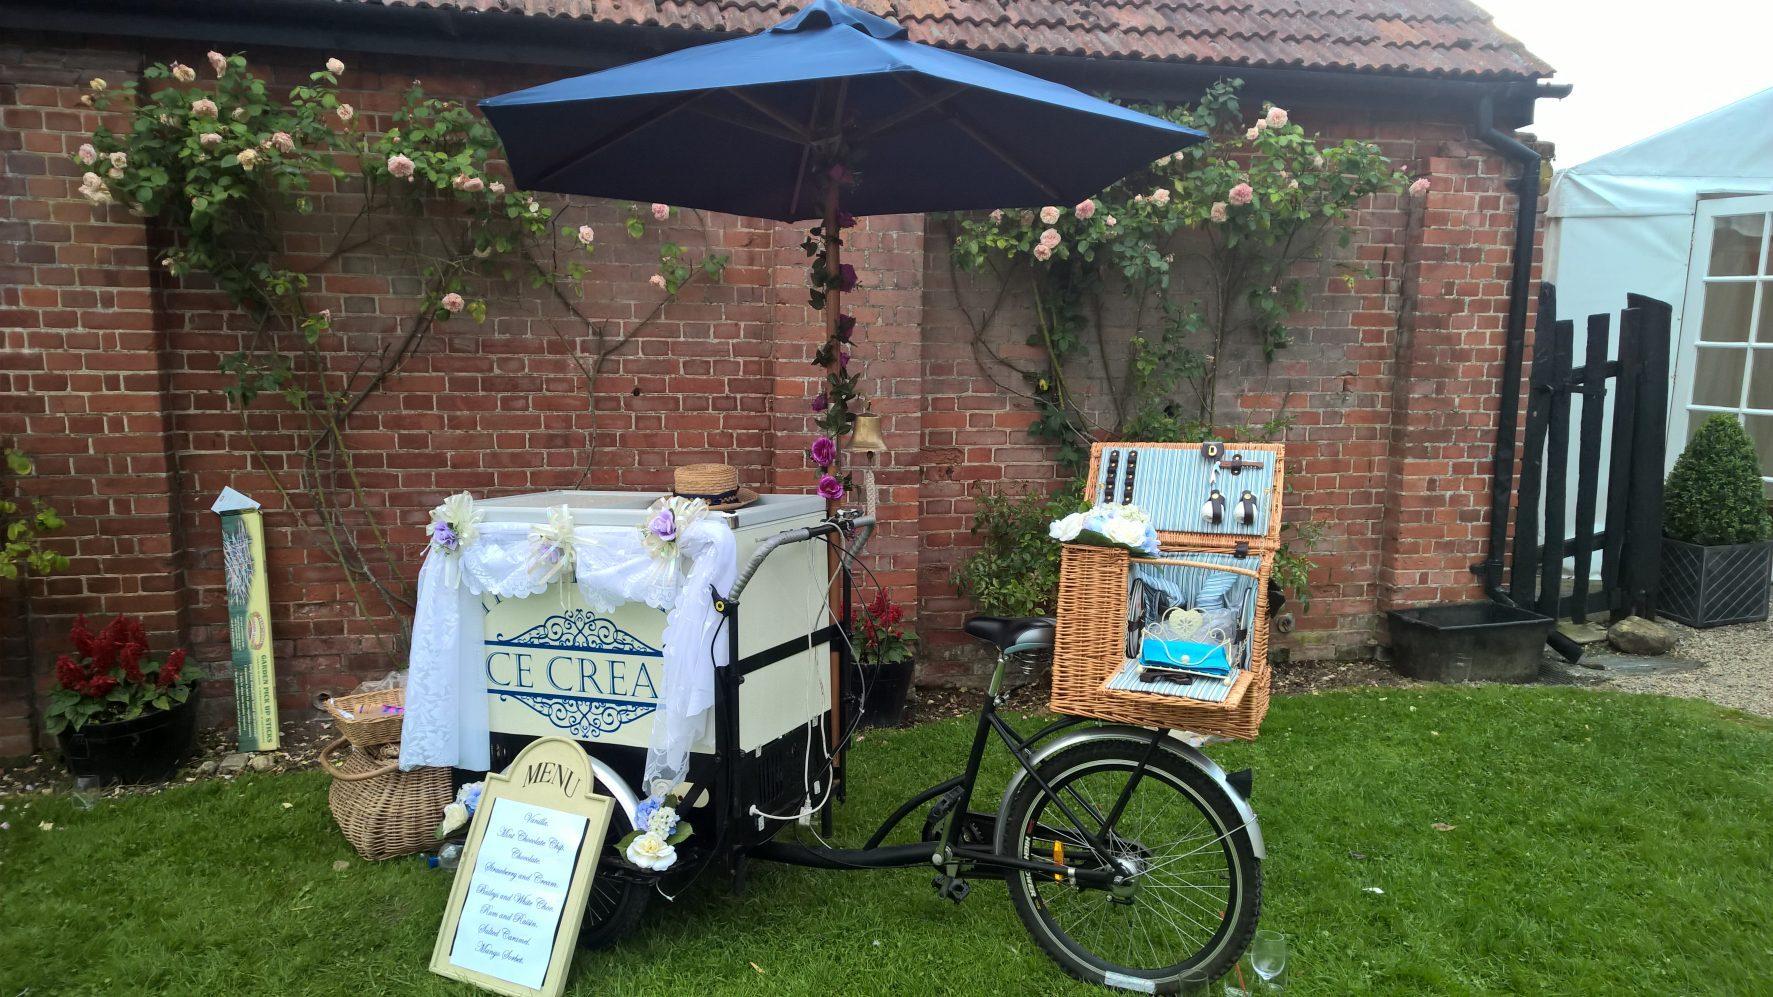 ice cream bicycle at wedding.